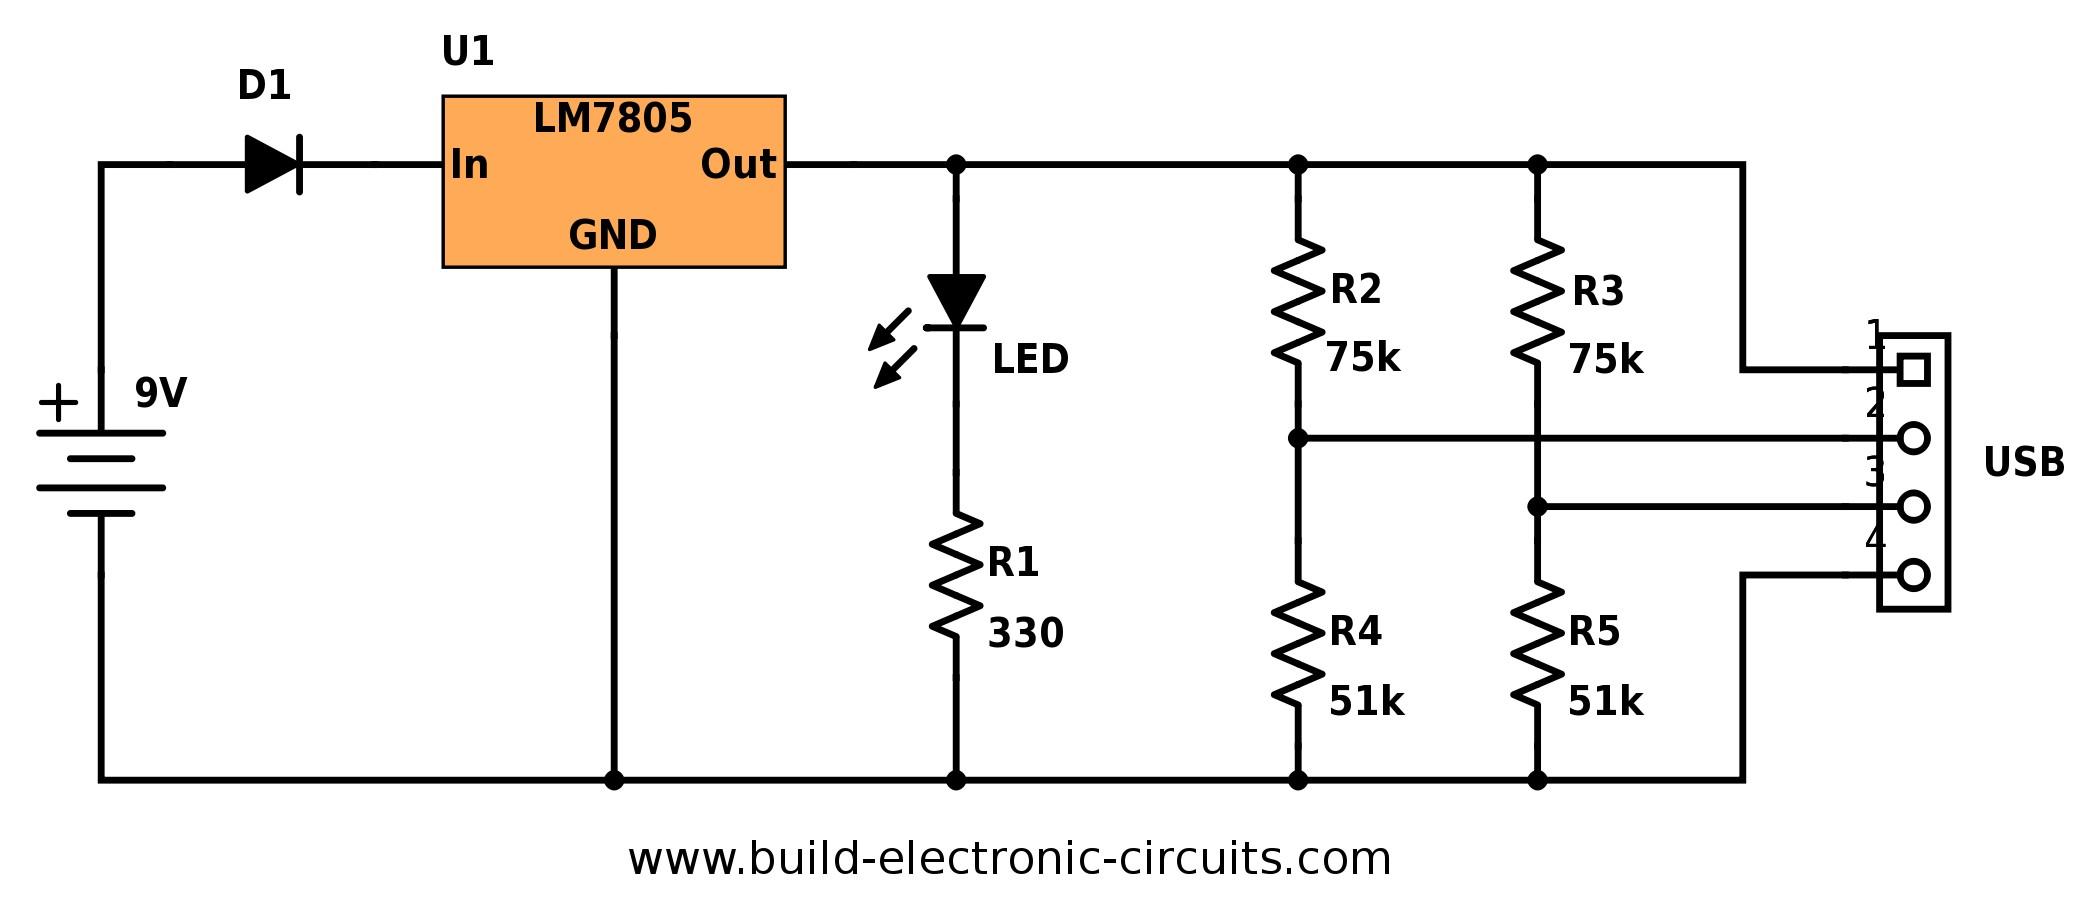 Portable USB charger circuit diagram